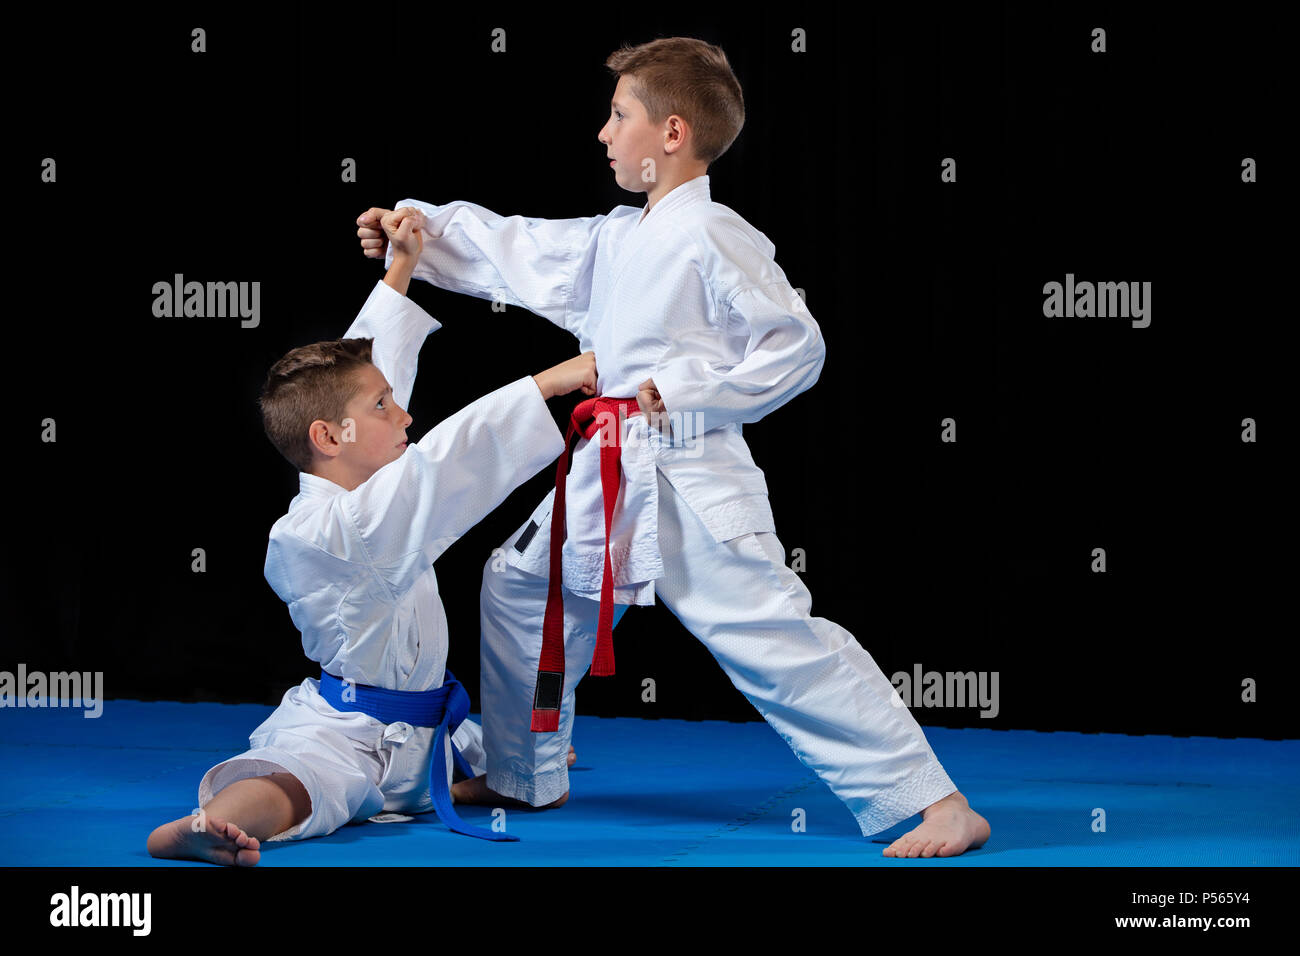 two boys training karate kata exercises at test qualification - Stock Image